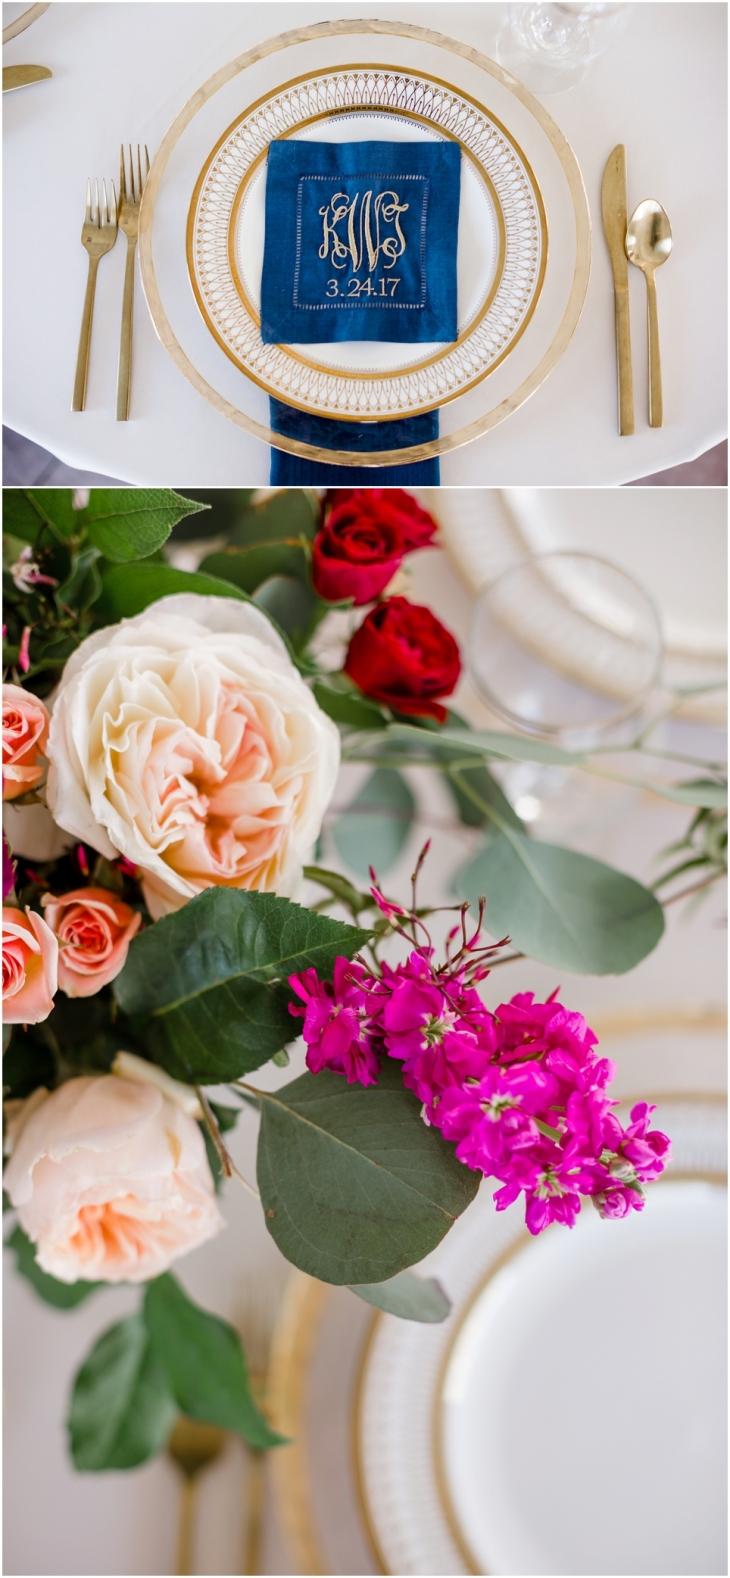 mod events charleston wedding photos